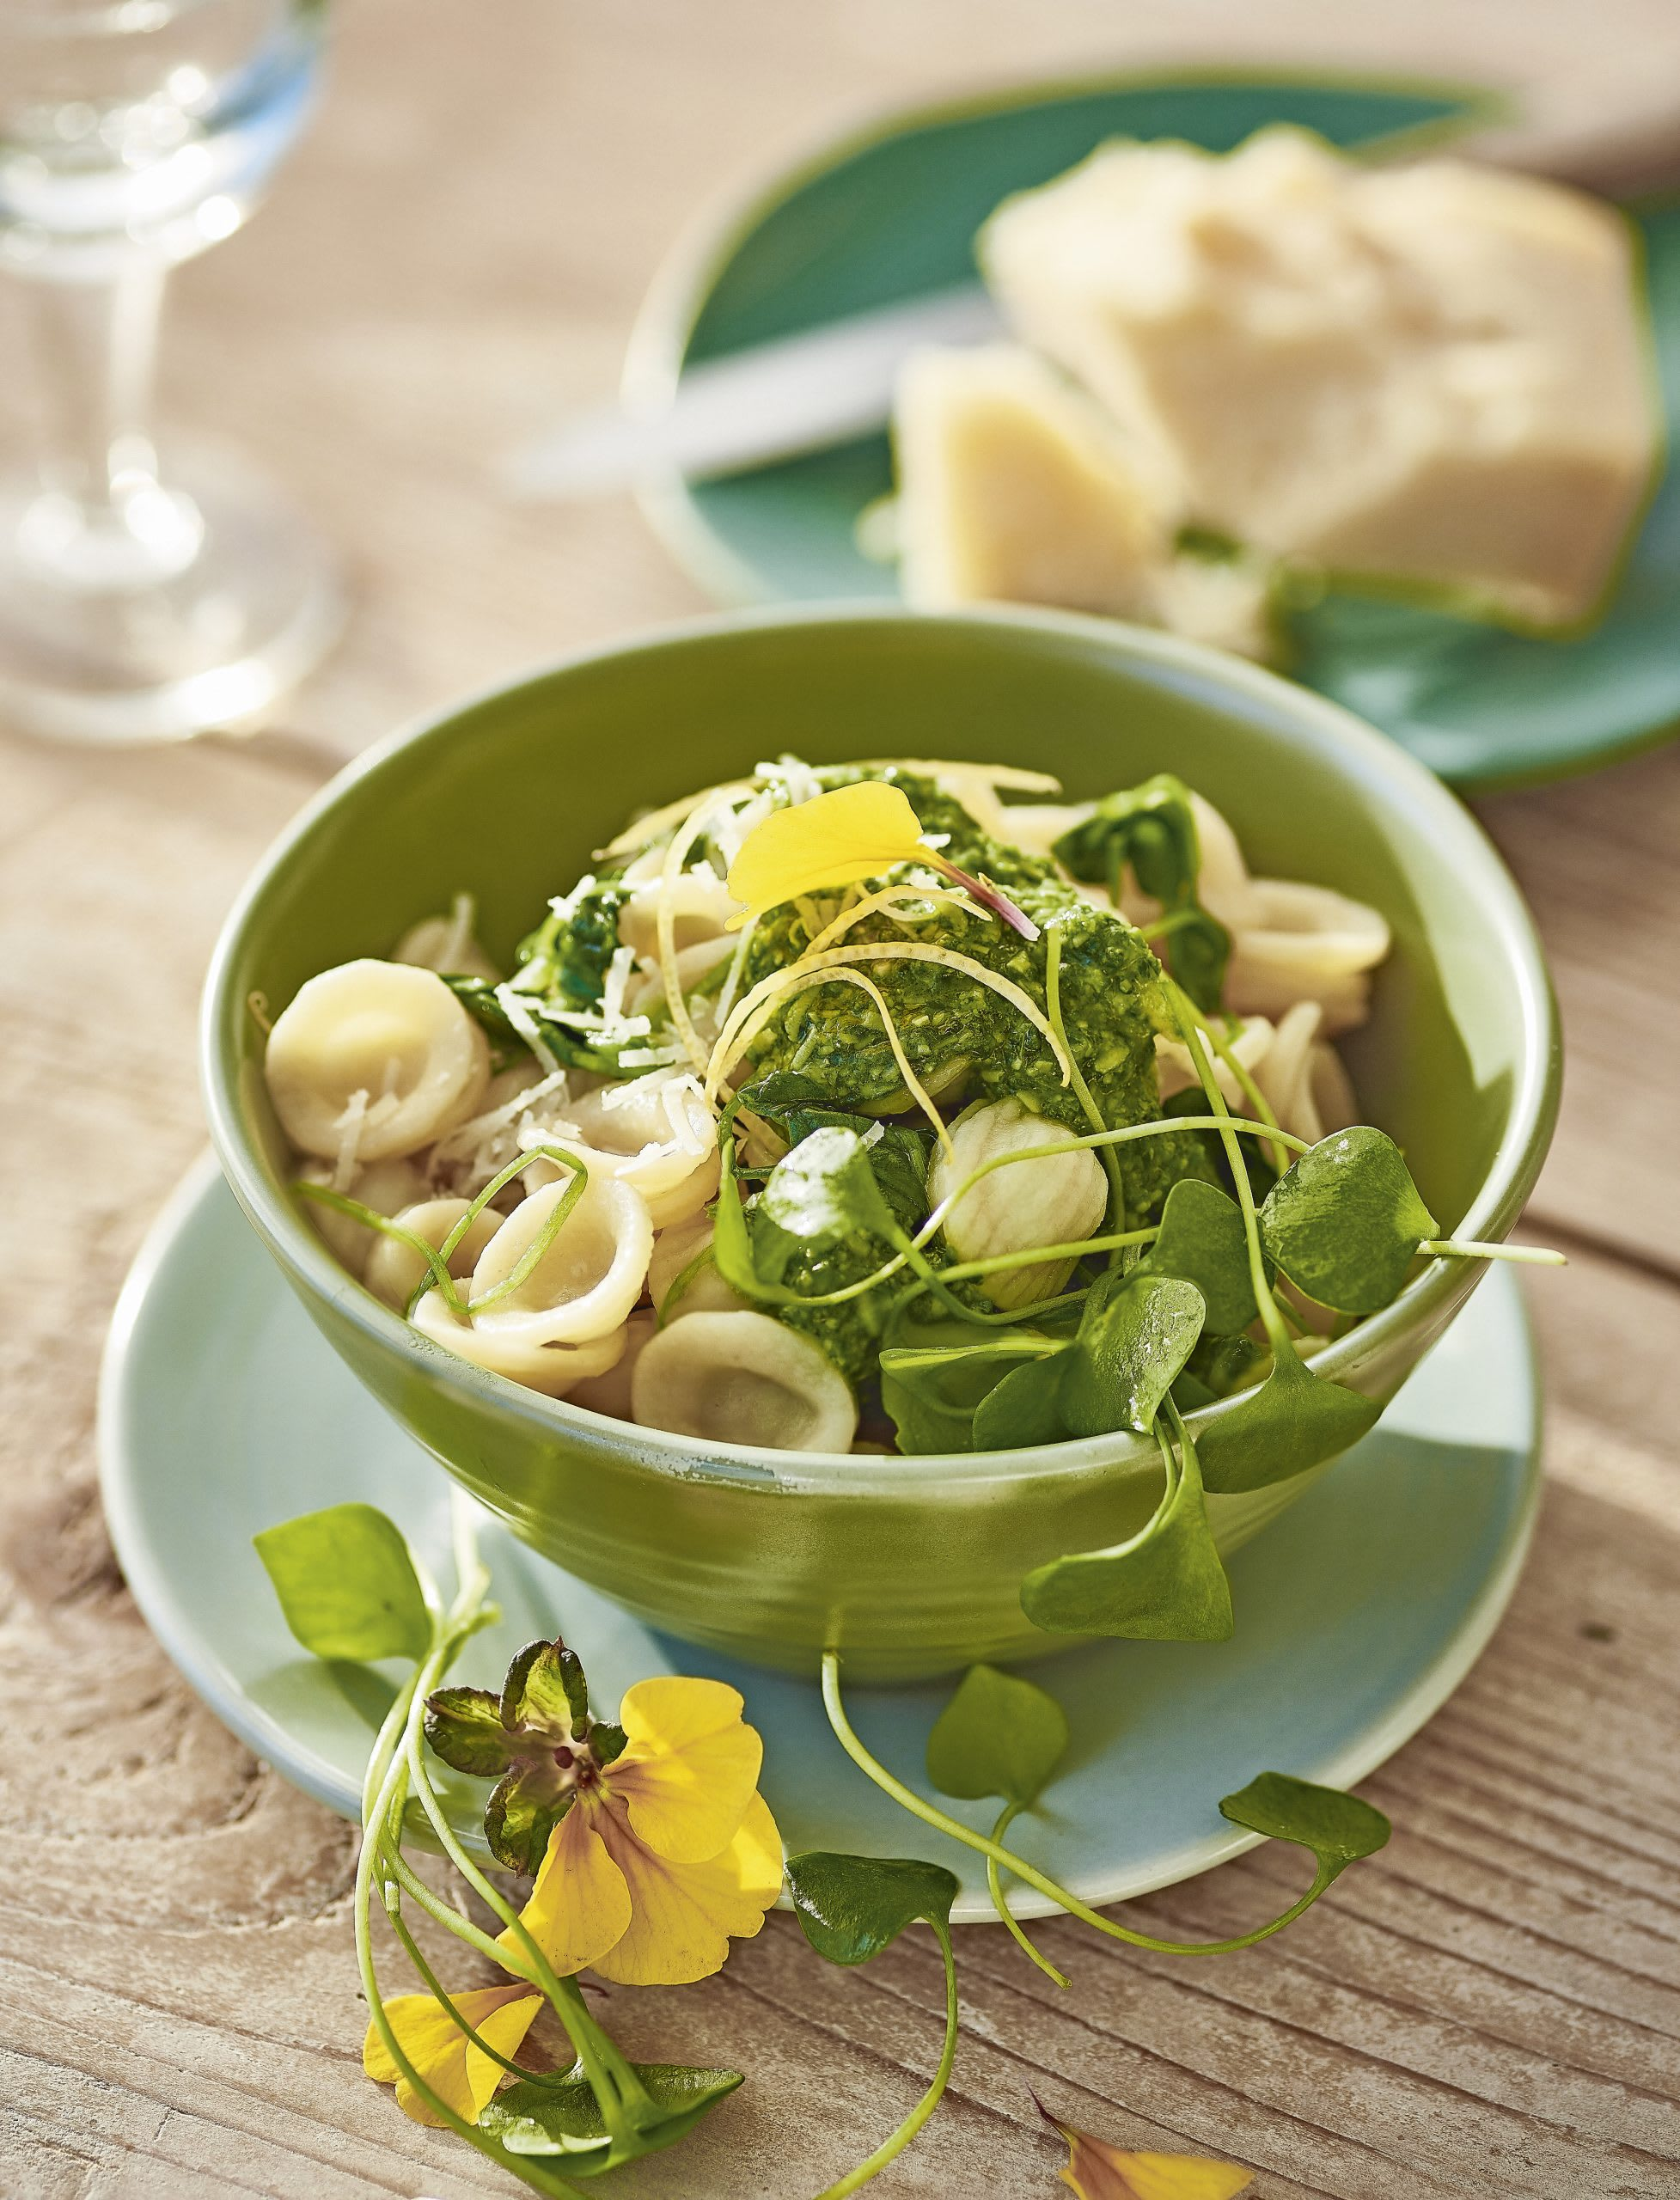 Orecchiette mit Portulak und Kräuter-Sbrinz-Pesto